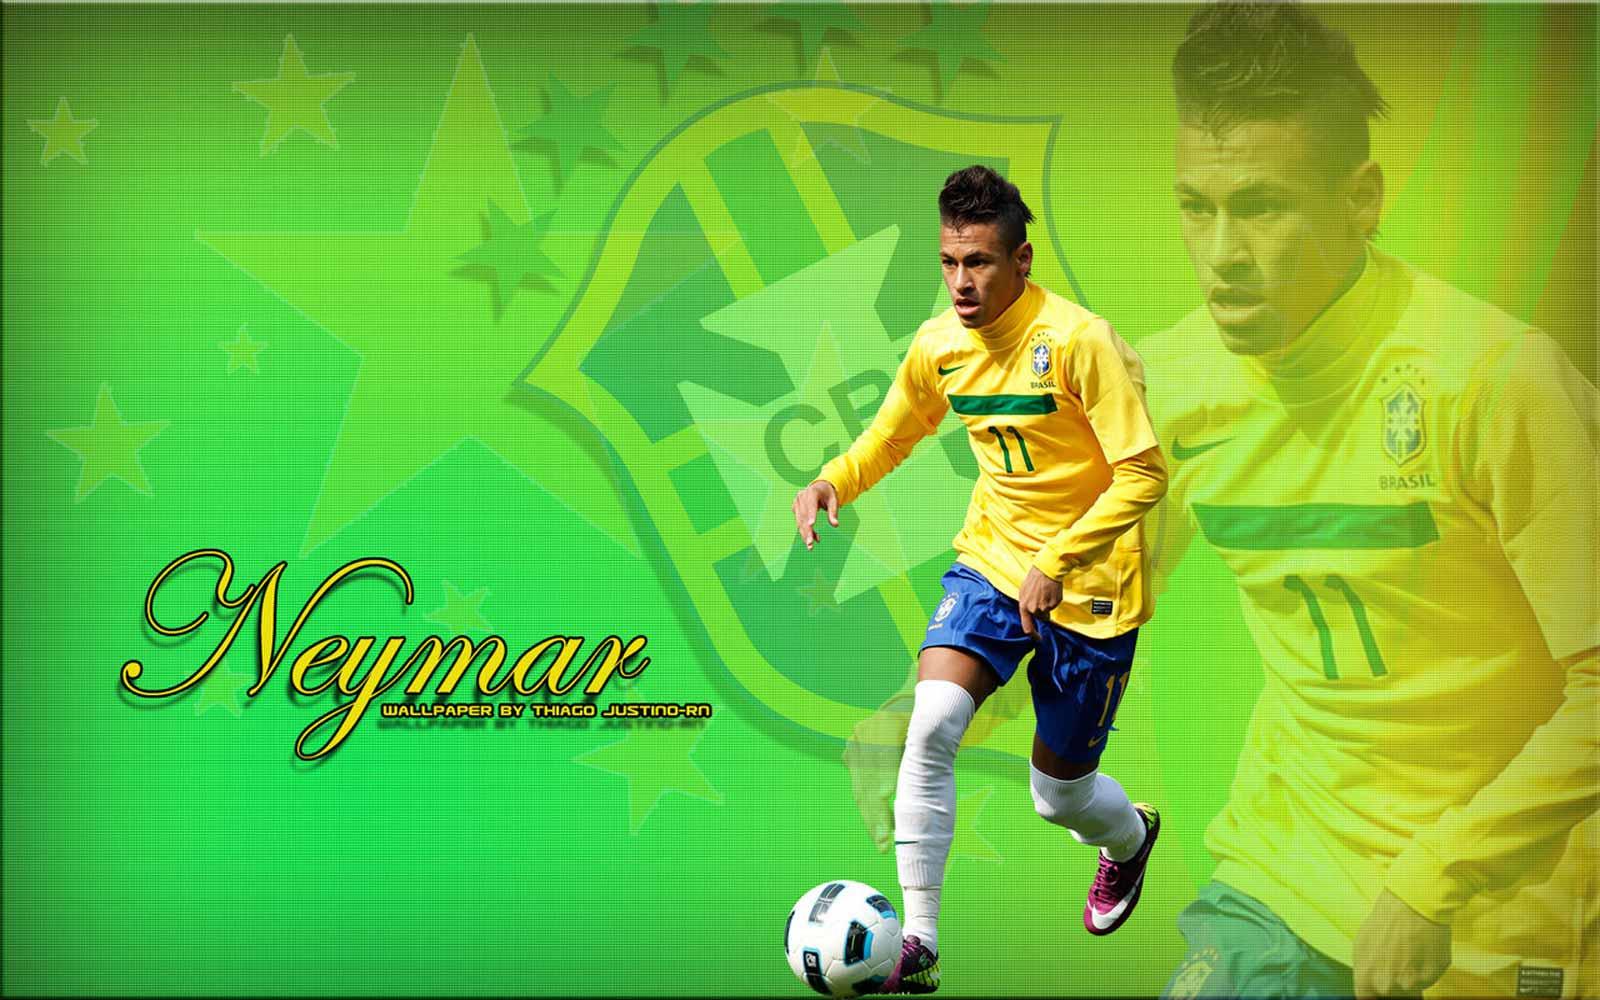 Neymar wallpapers digital hd photos - Neymar brazil hd ...